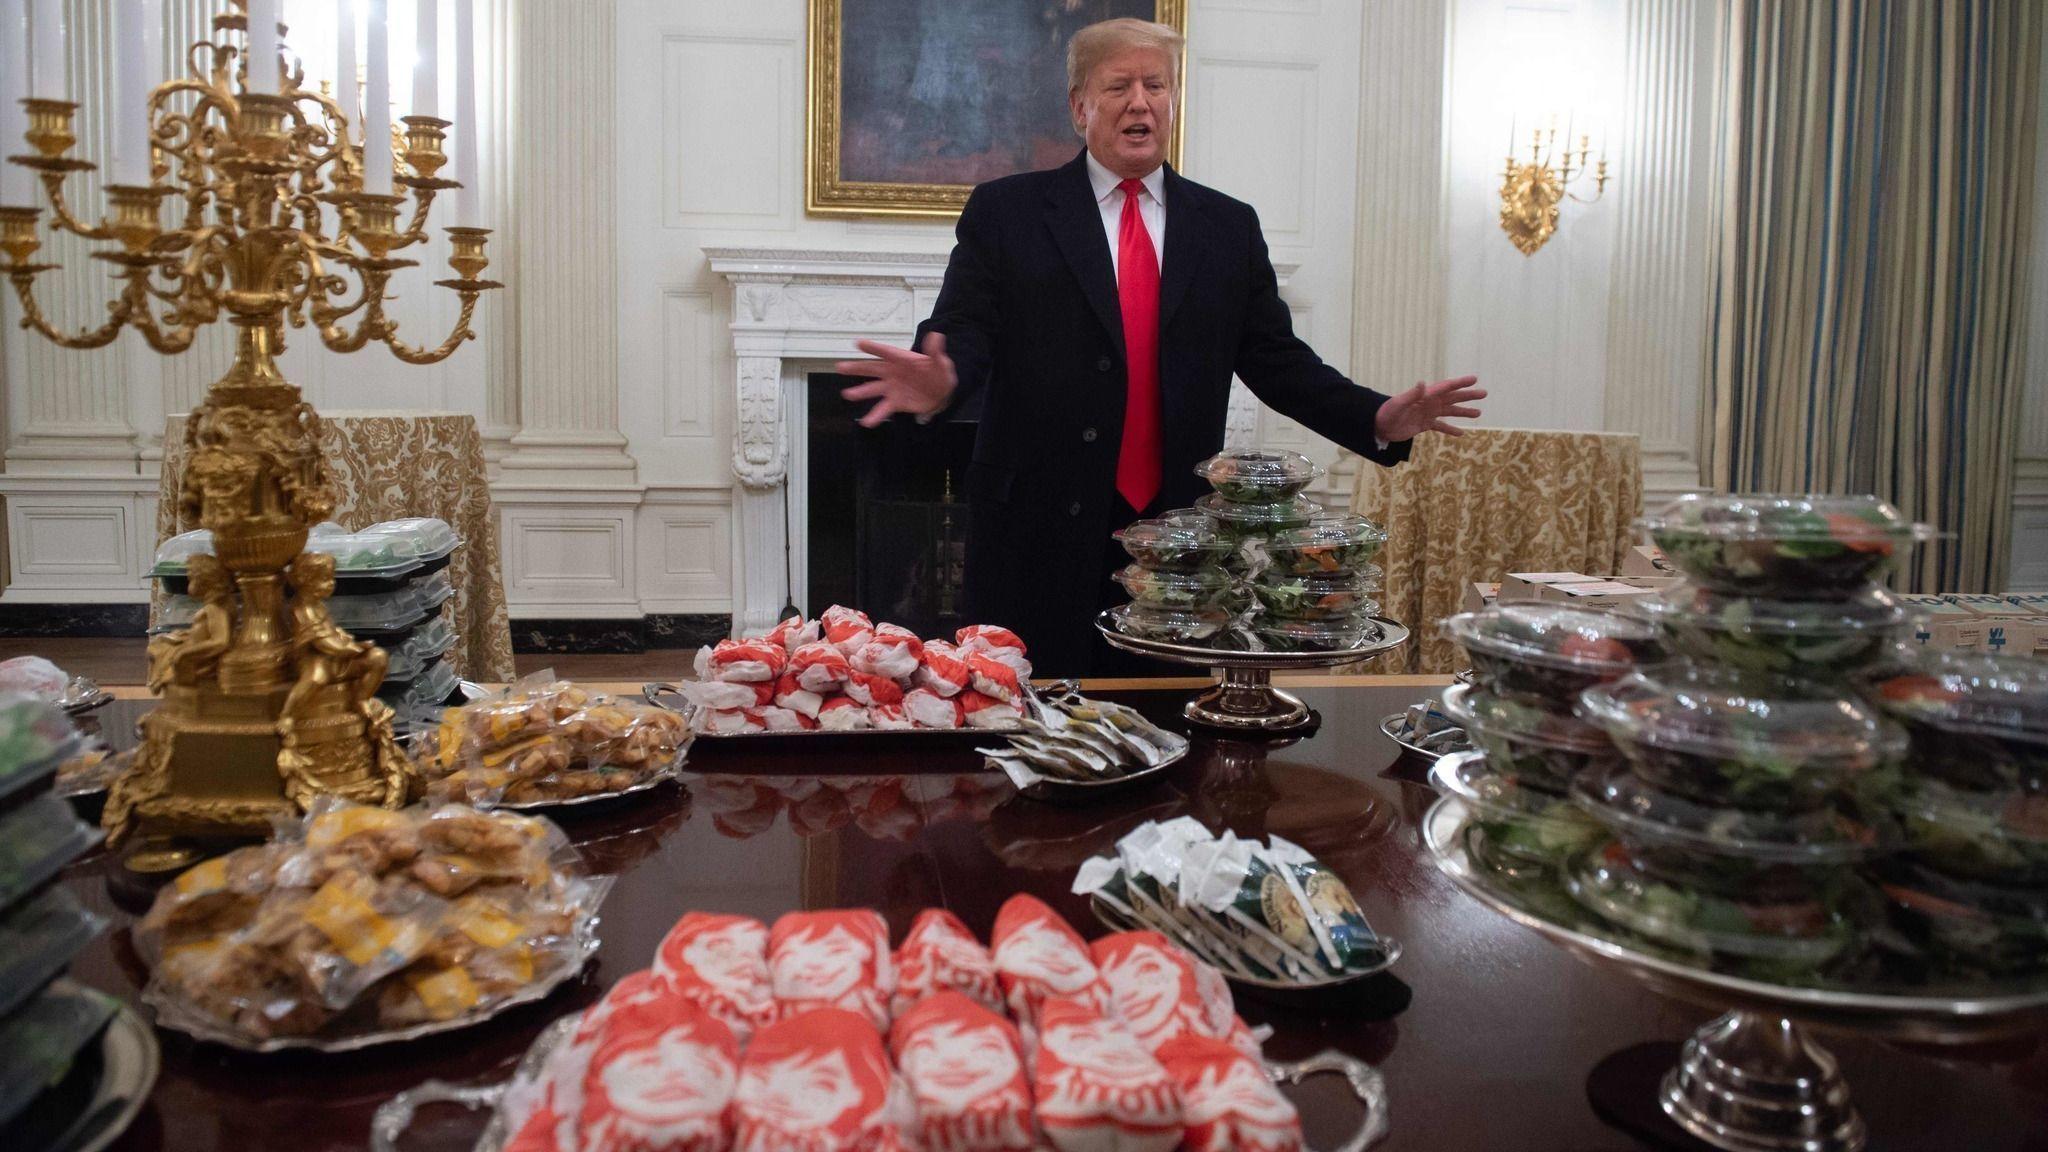 Jesse Jackson says President Trump serving fast food to Clemson football team was 'disgraceful'